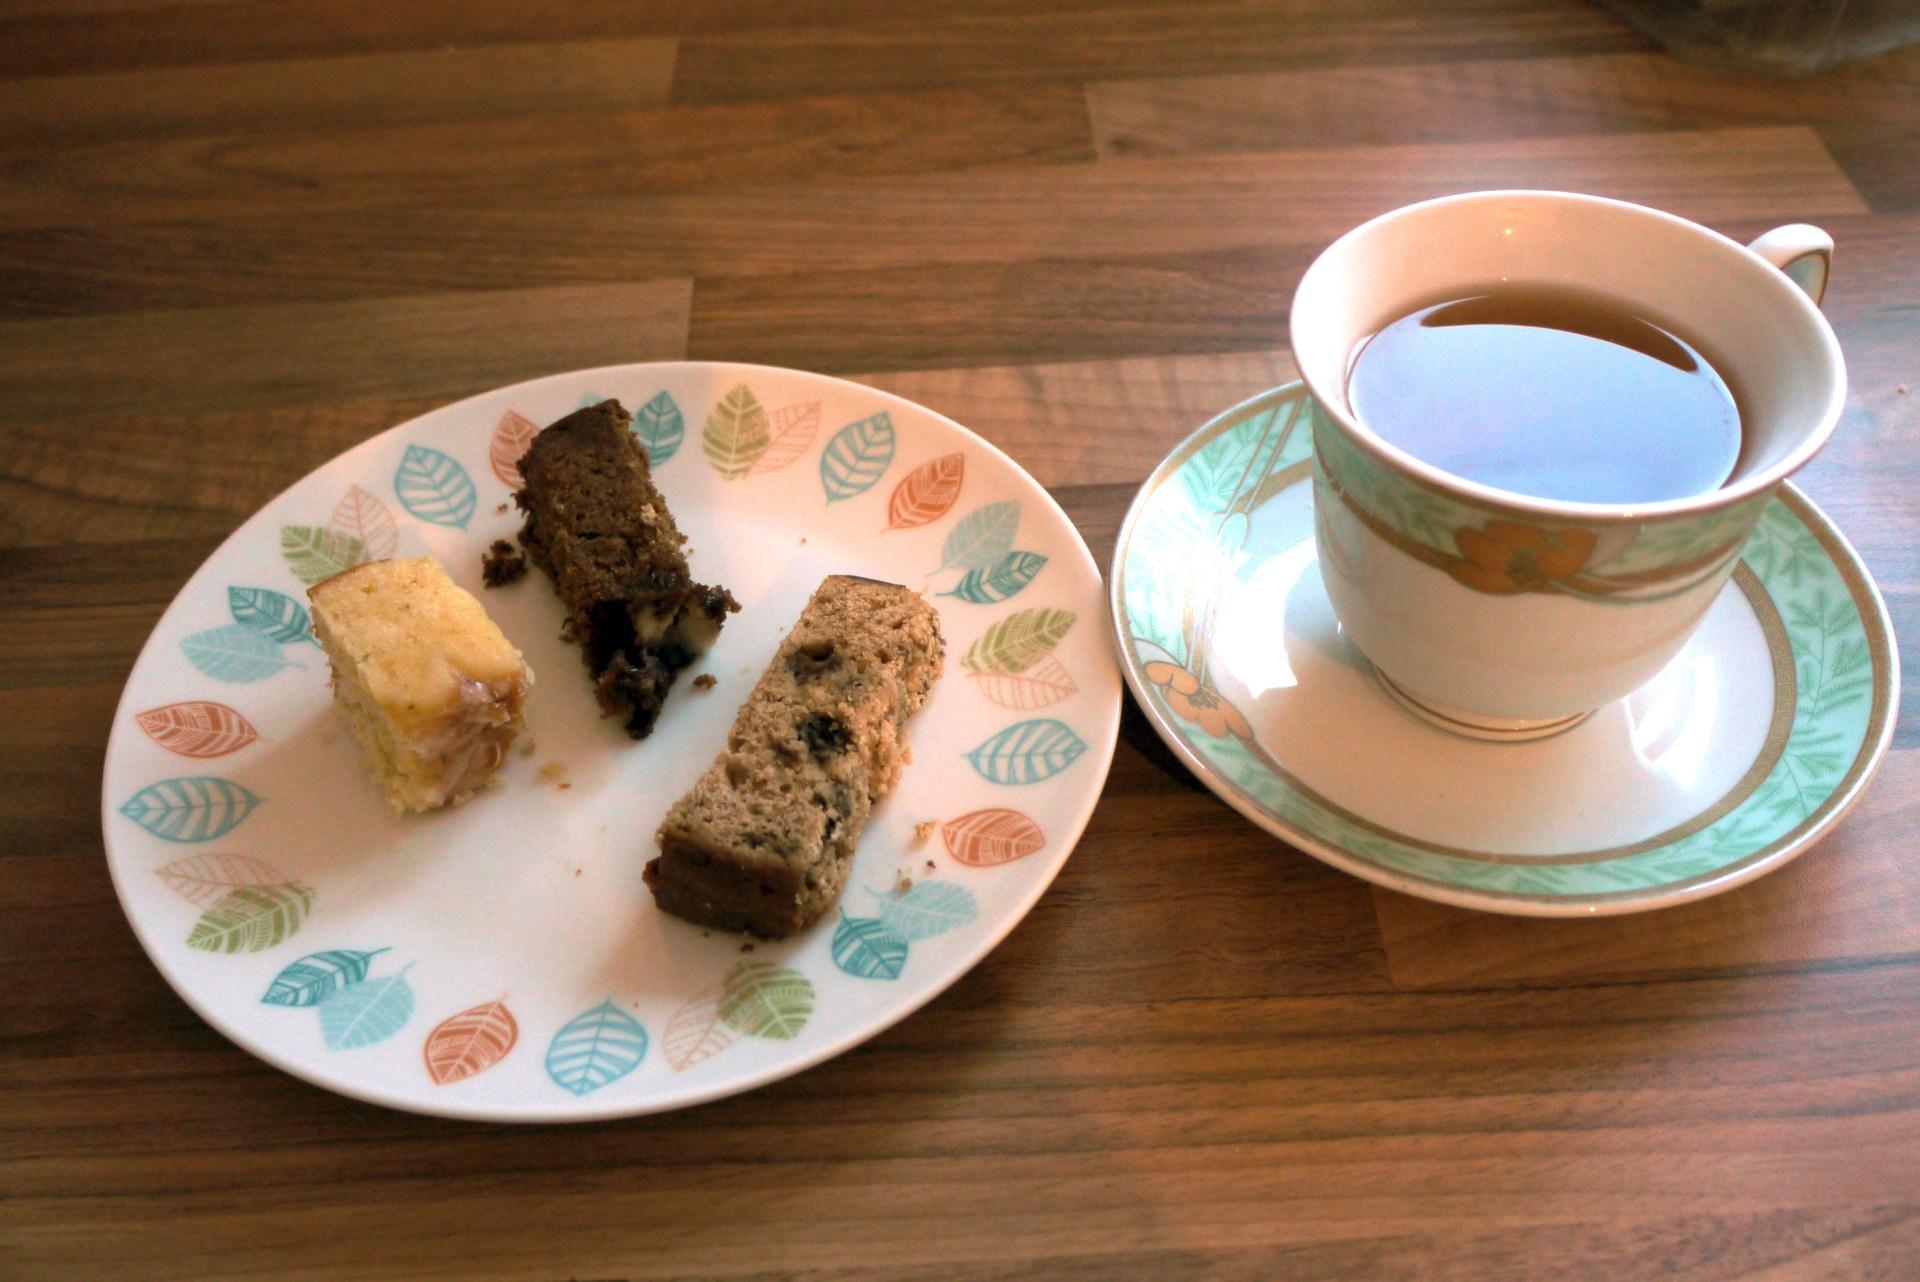 Lemon Drizzle cakes with tea